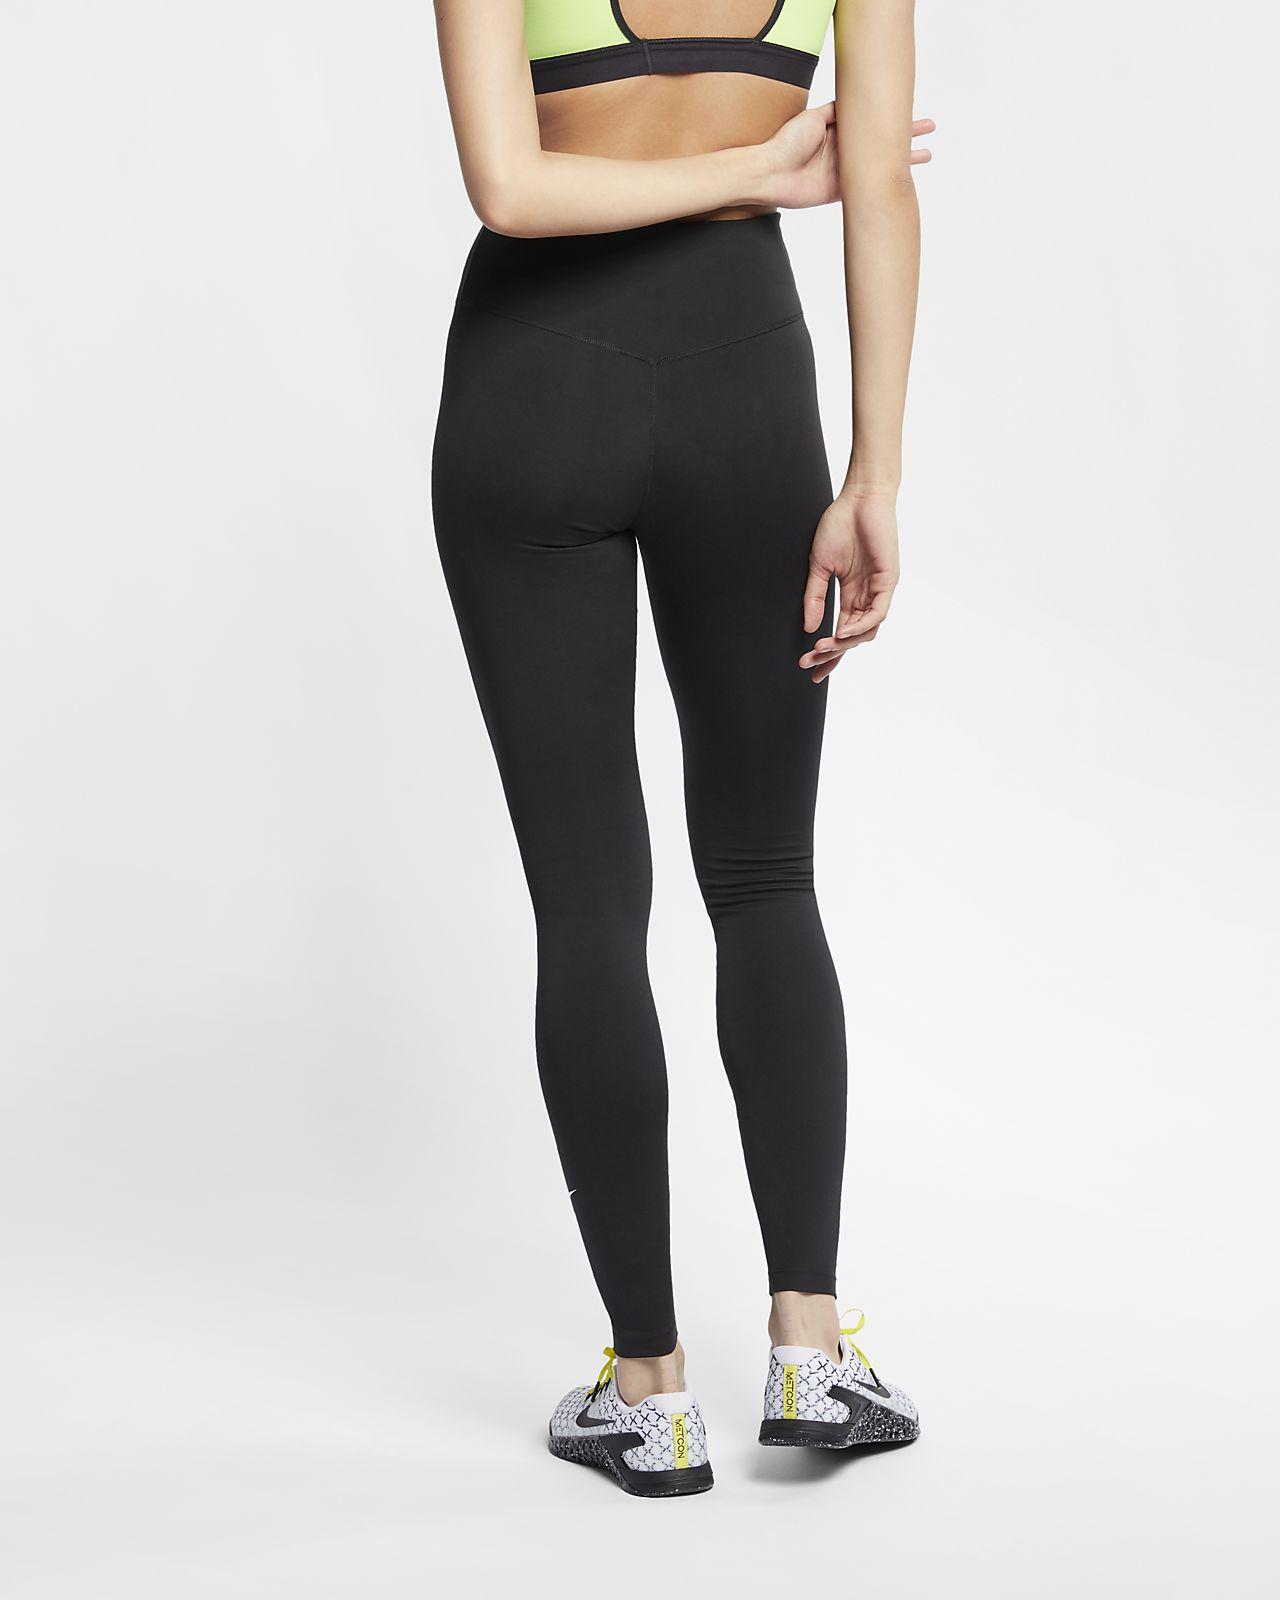 a6eb2e610096 Low Resolution Γυναικείο κολάν Nike One Γυναικείο κολάν Nike One